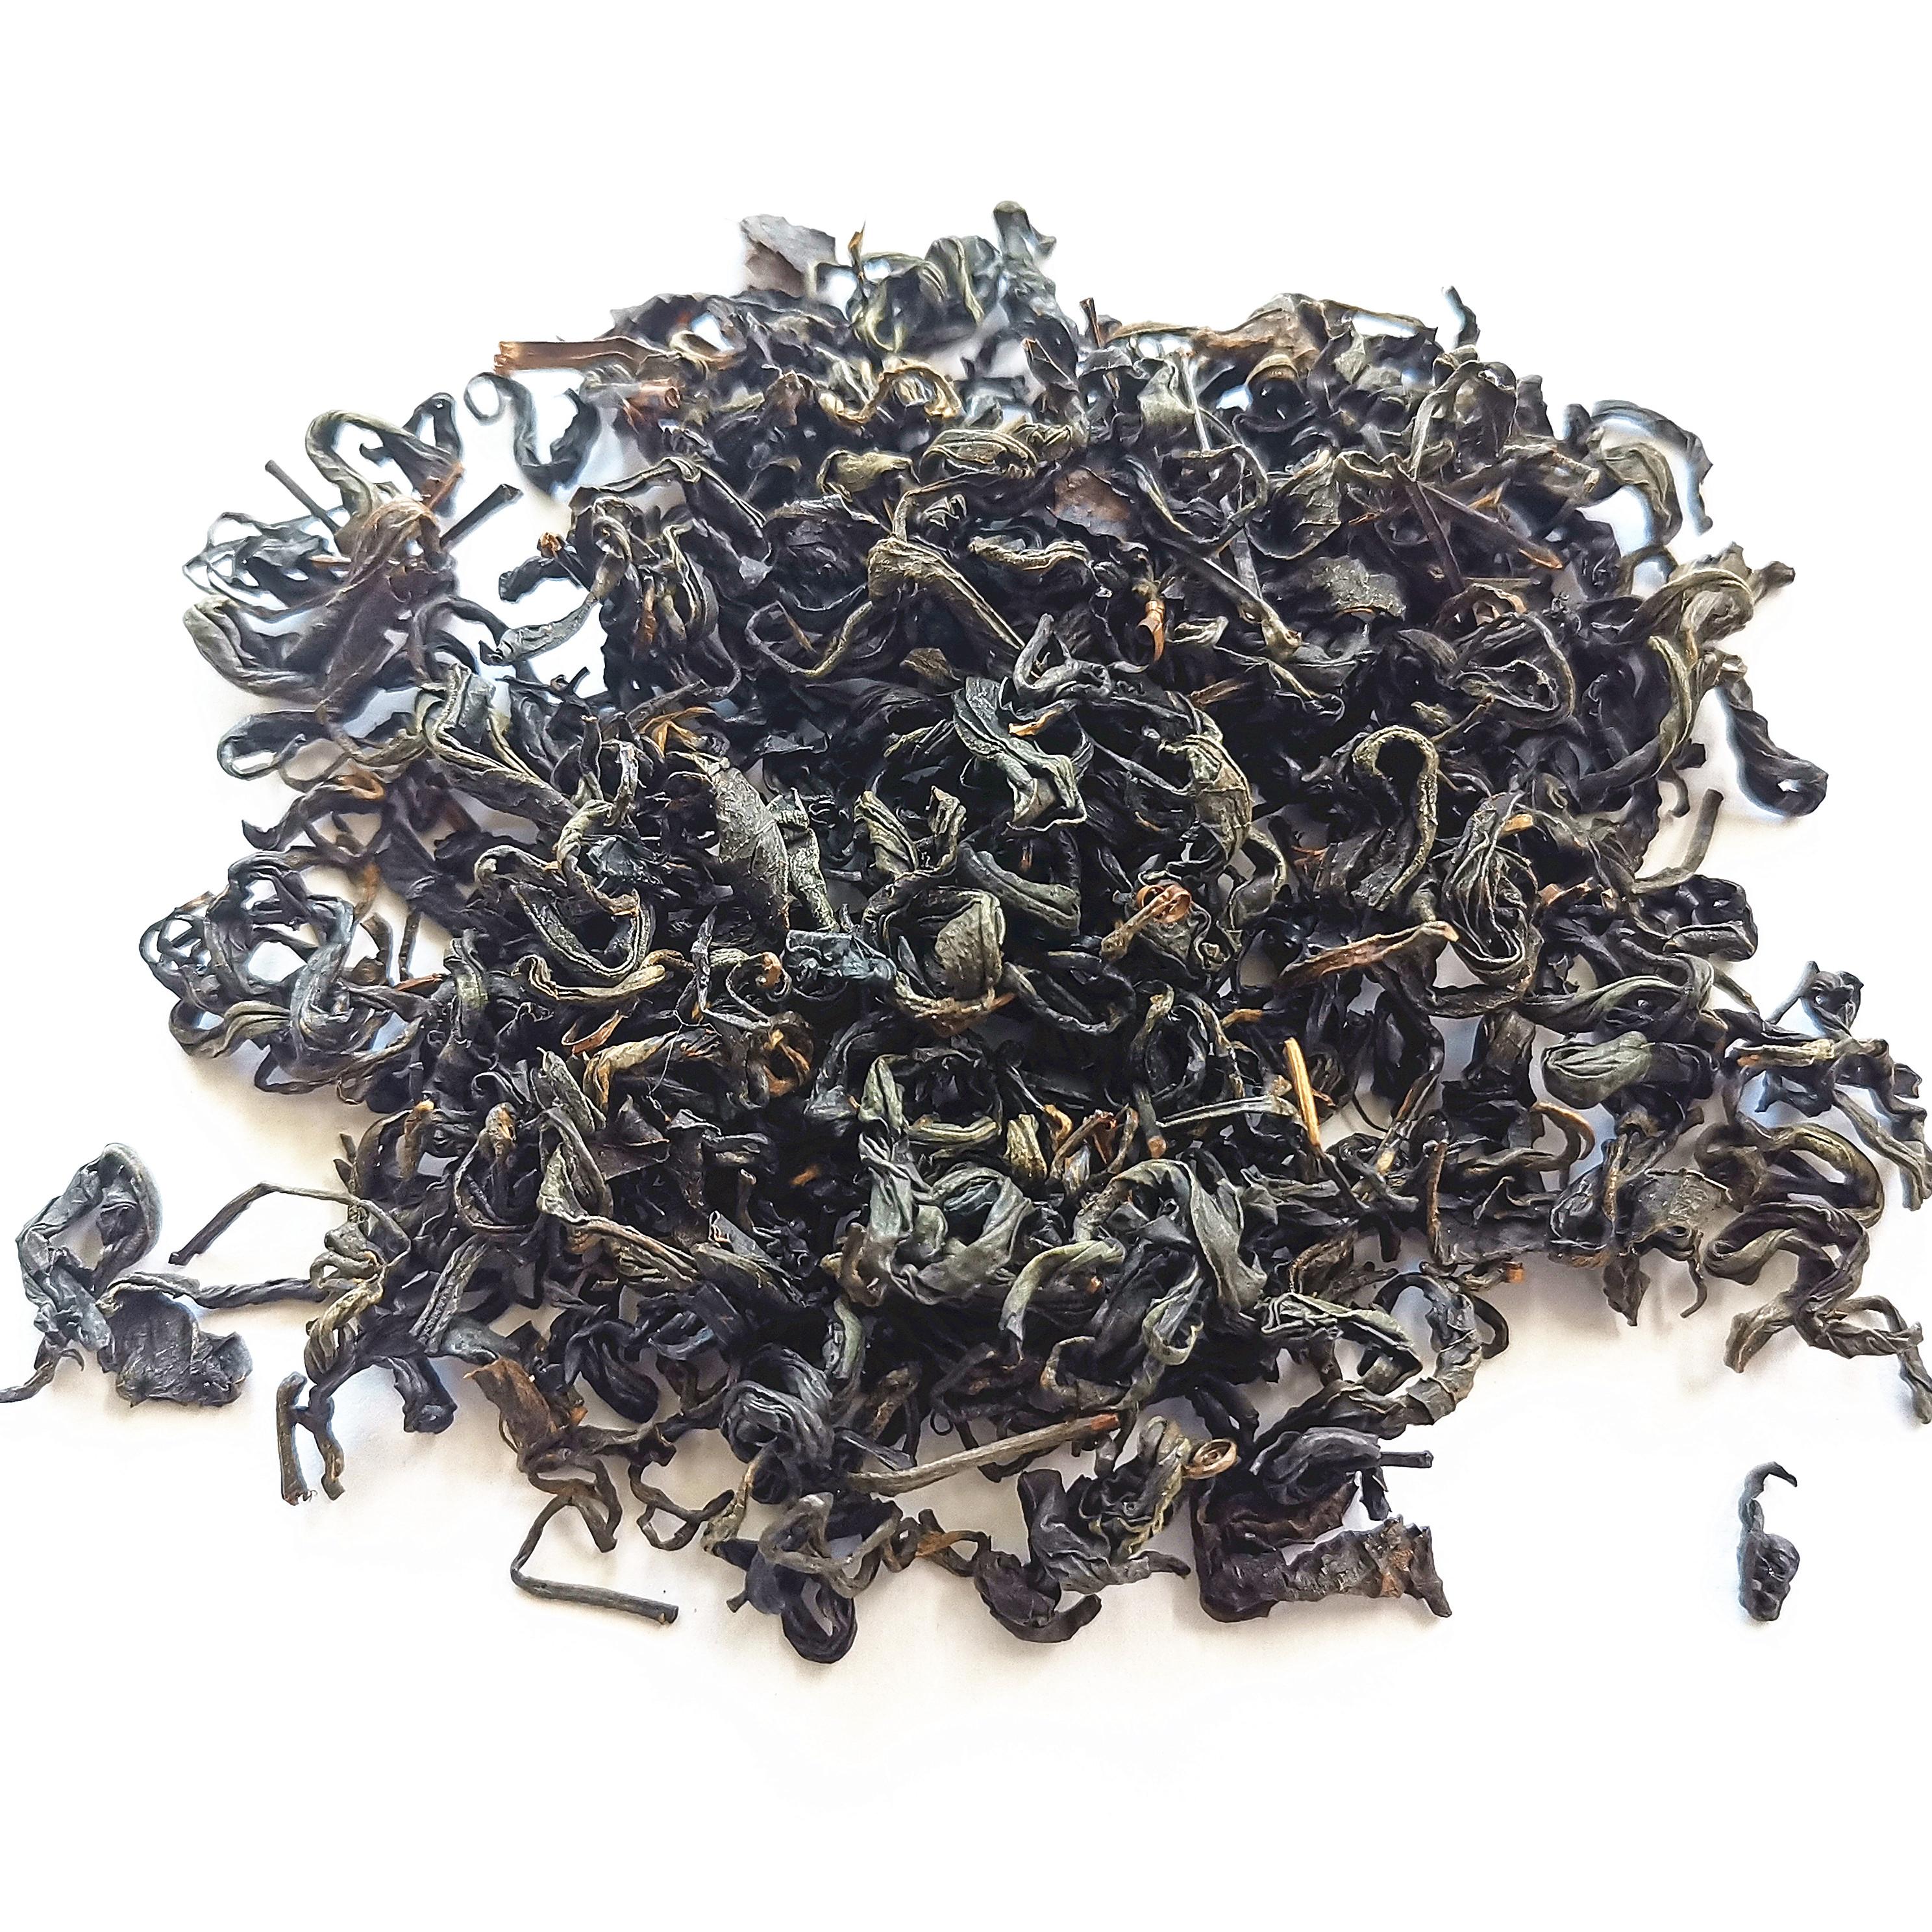 A-Organic slimming tea China famous black tea in bulk - 4uTea   4uTea.com